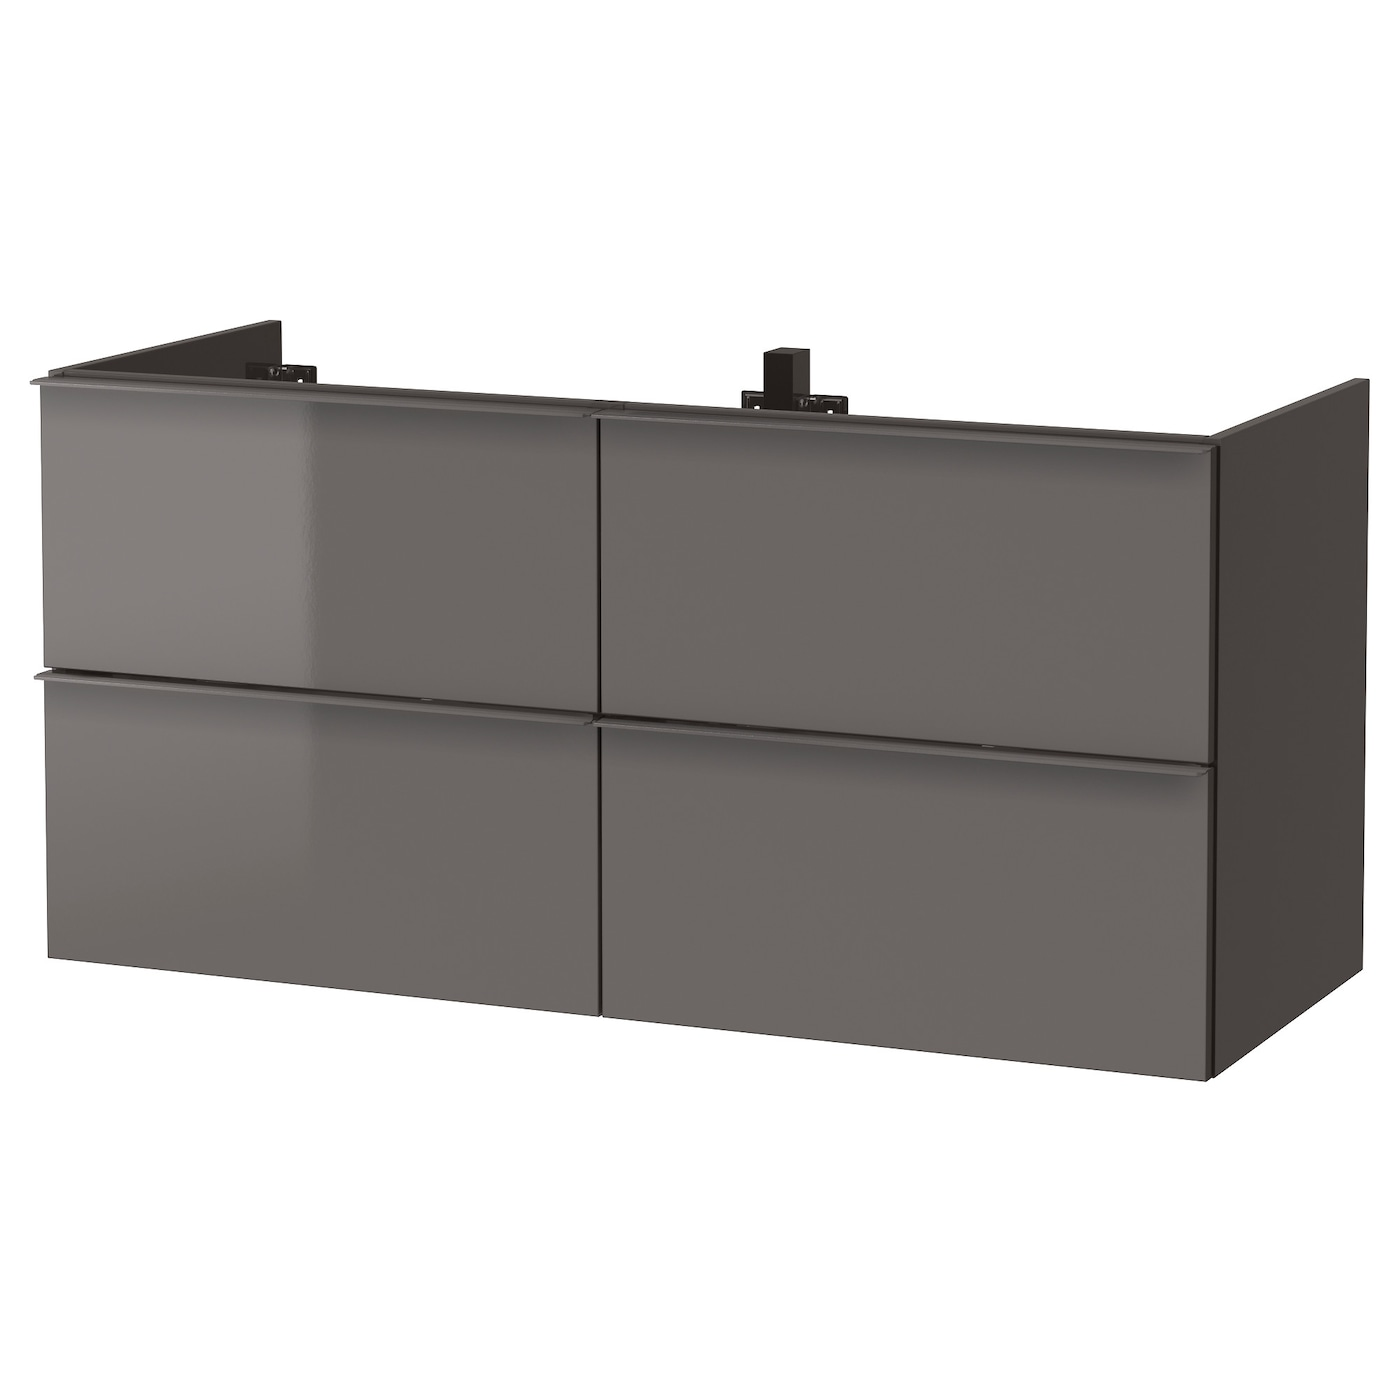 godmorgon meuble lavabo 4tir brillant gris 120 x 47 x 58 cm ikea. Black Bedroom Furniture Sets. Home Design Ideas